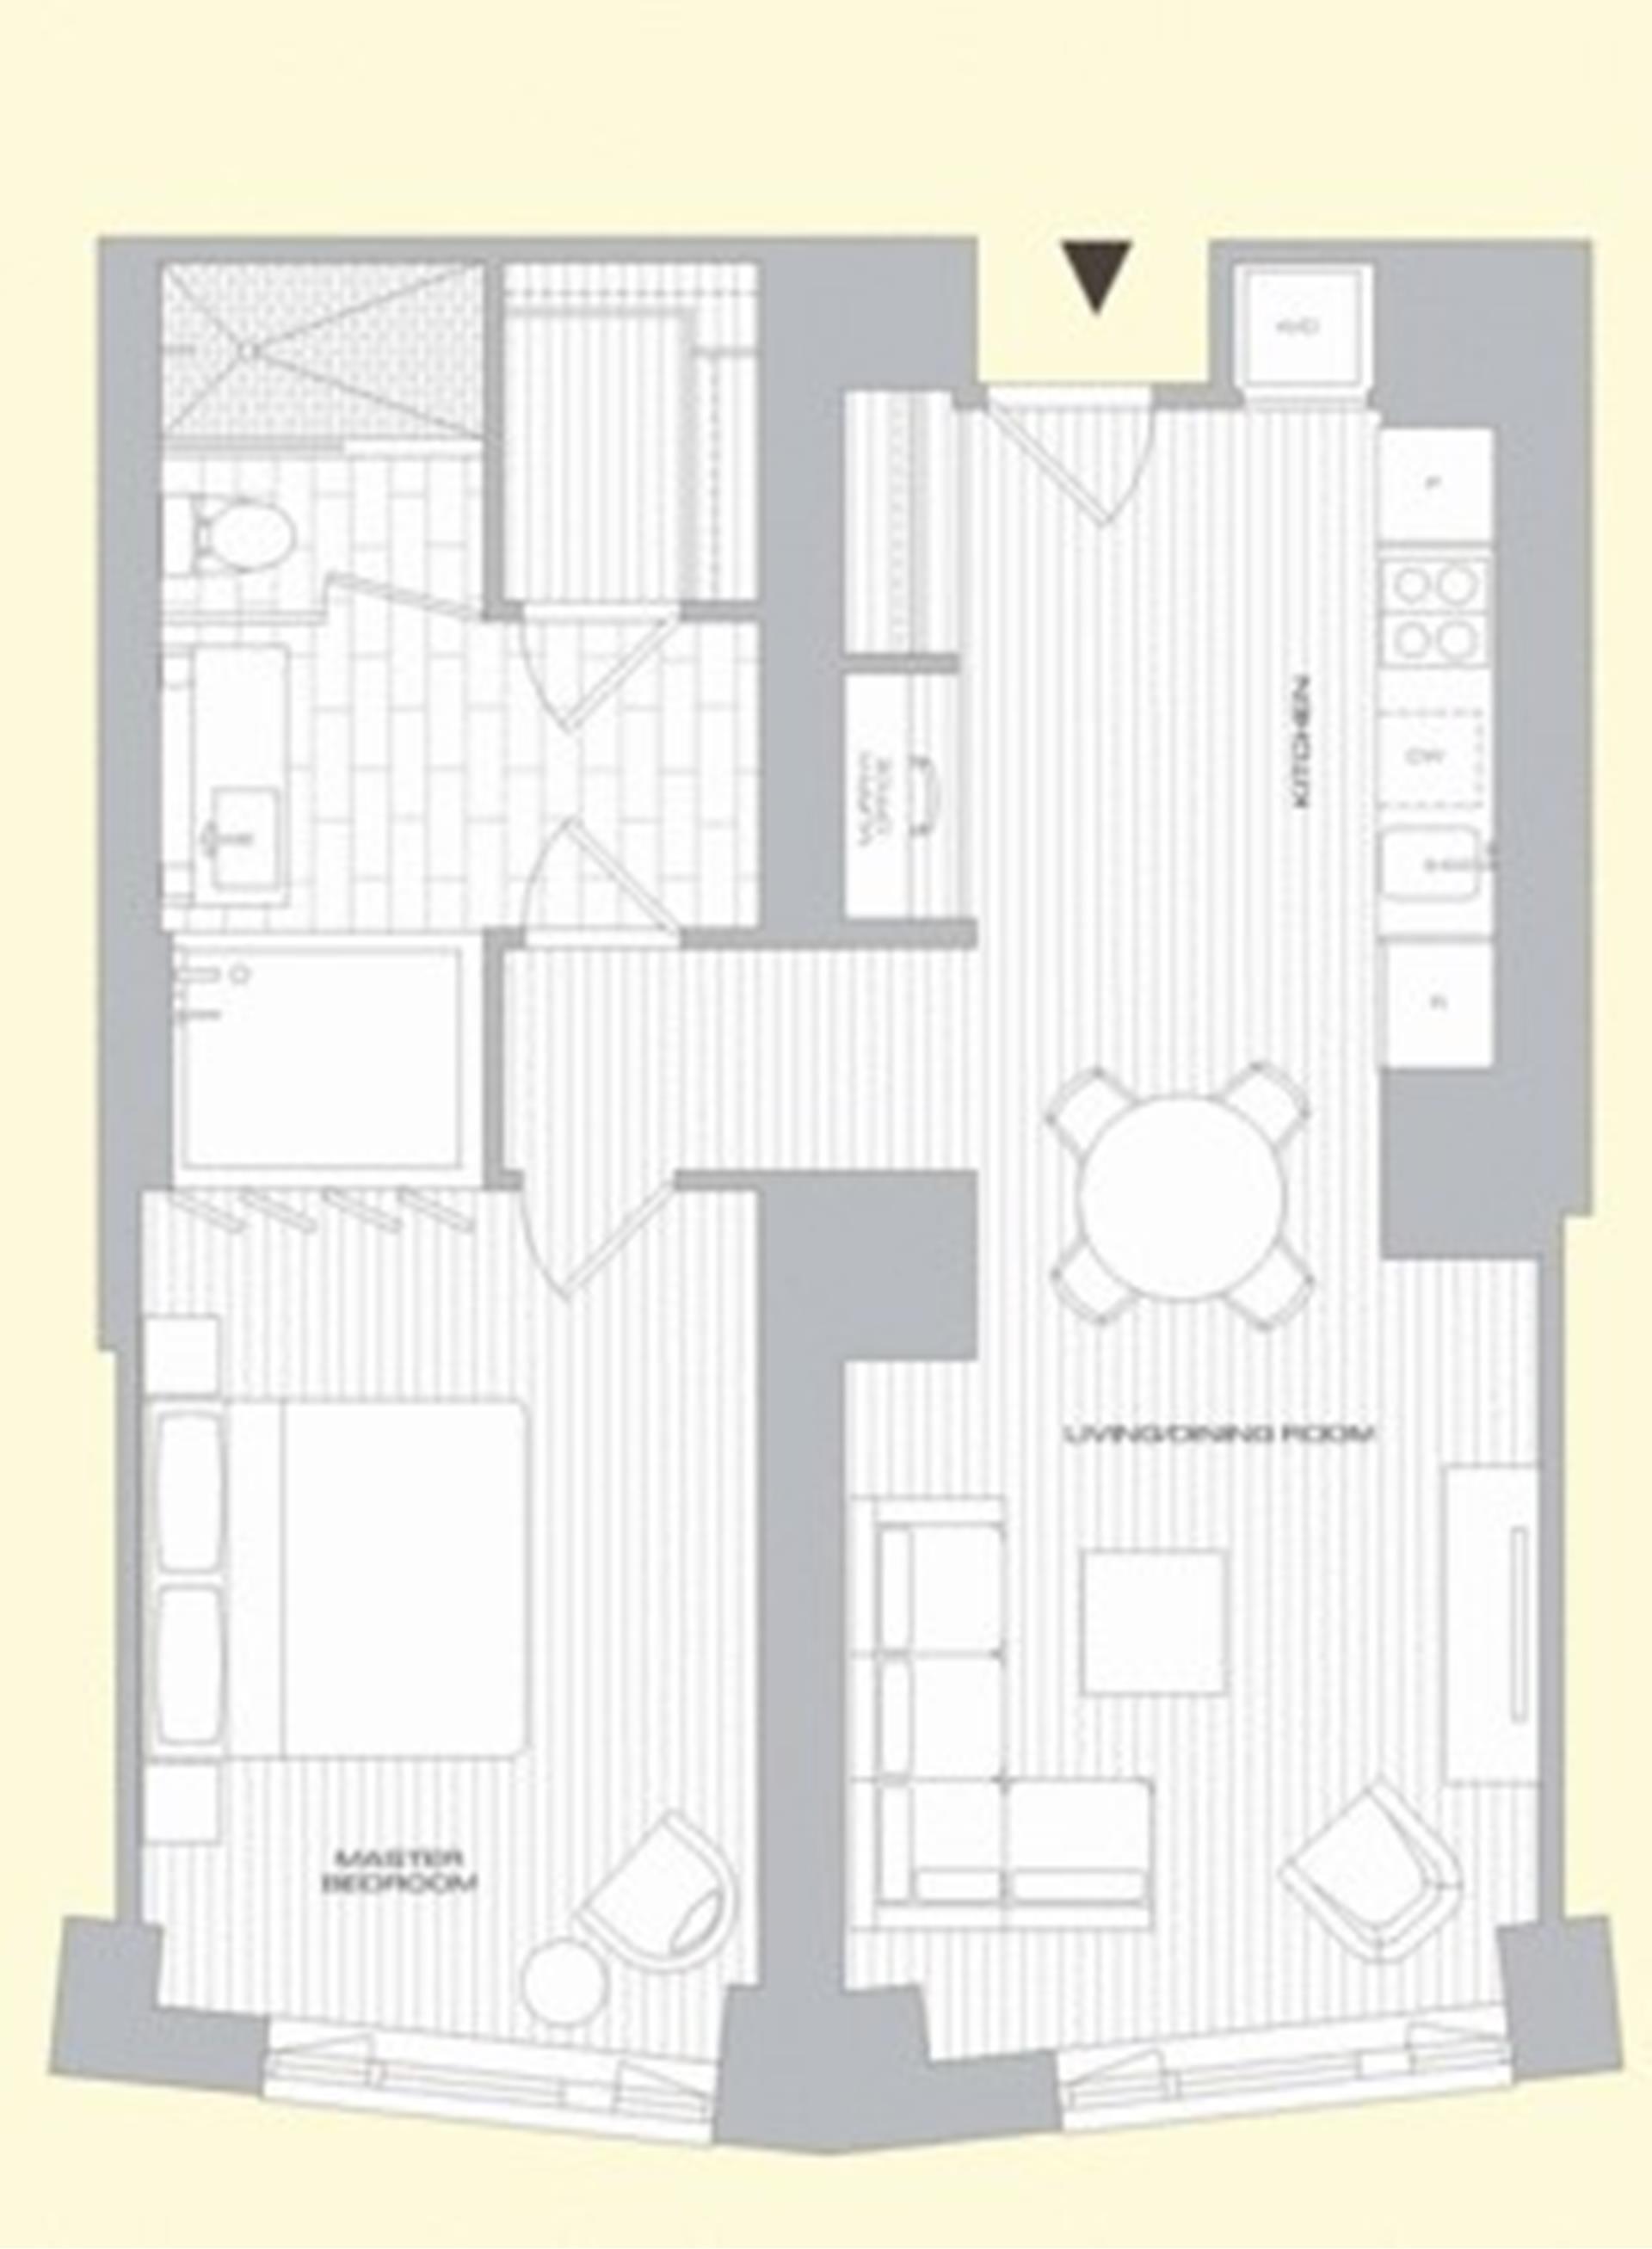 Floor plan of 15 William, 15 William Street, 18C - Financial District, New York